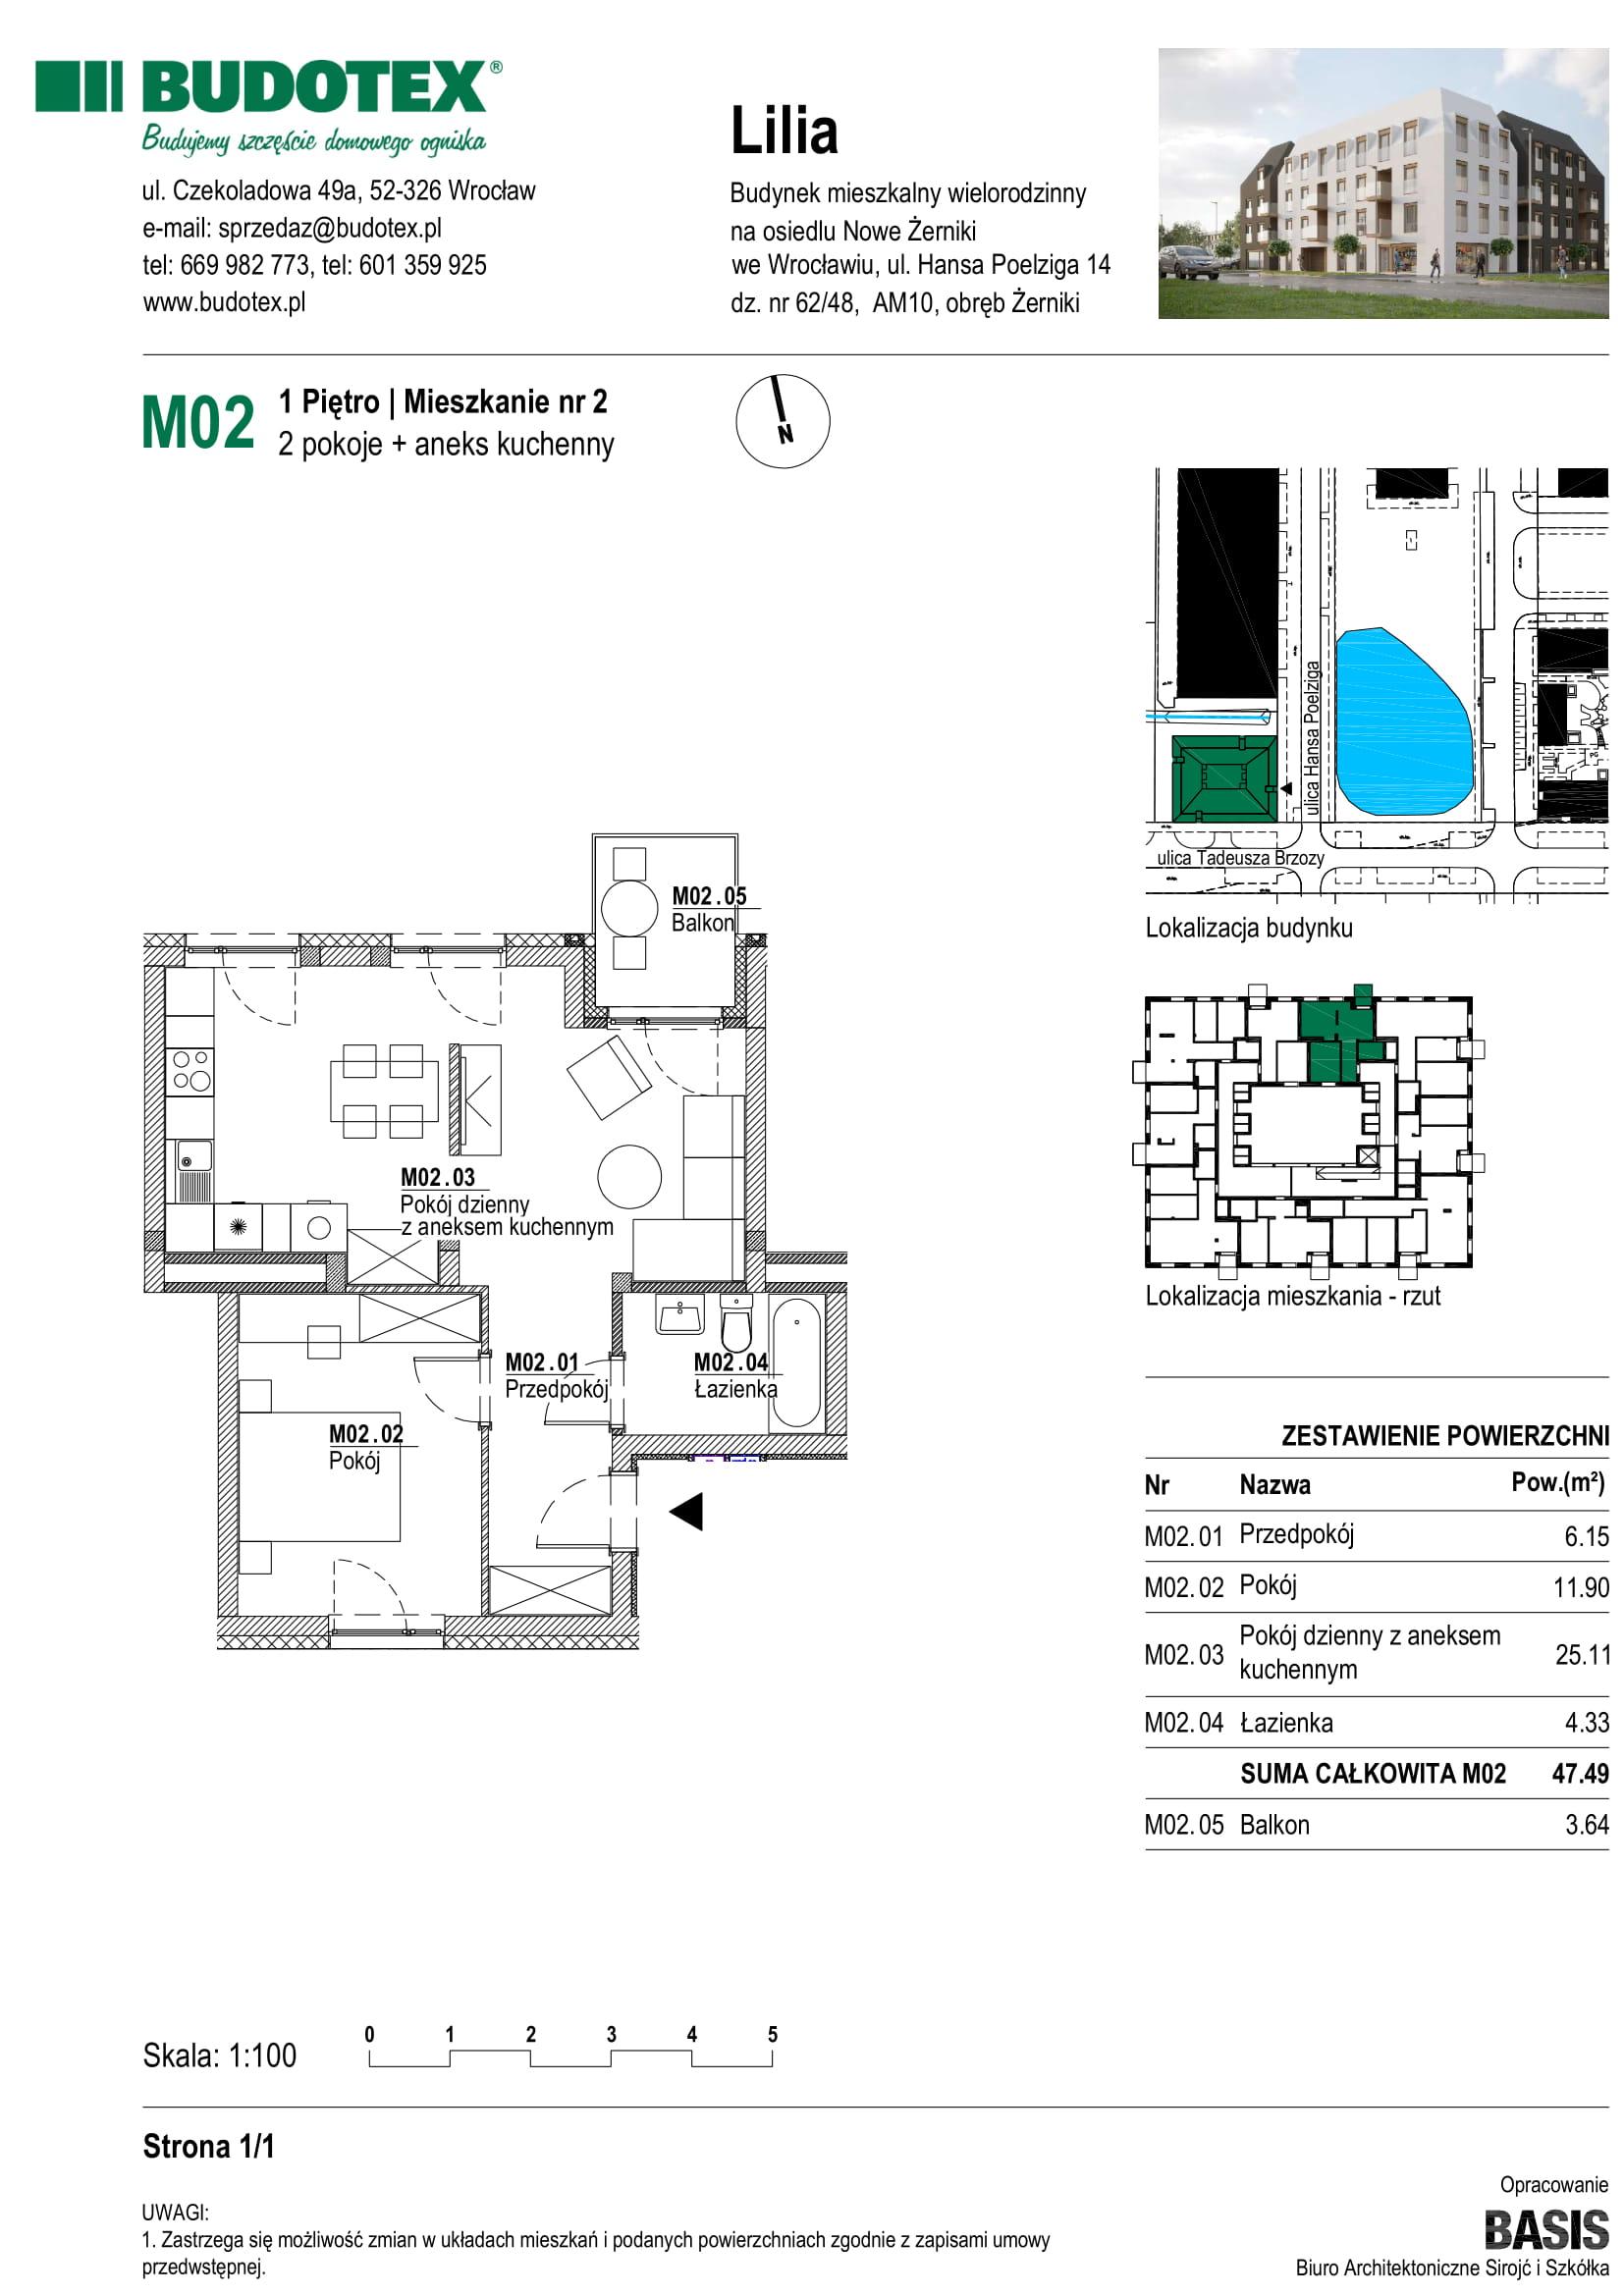 Mieszkanie nr M02